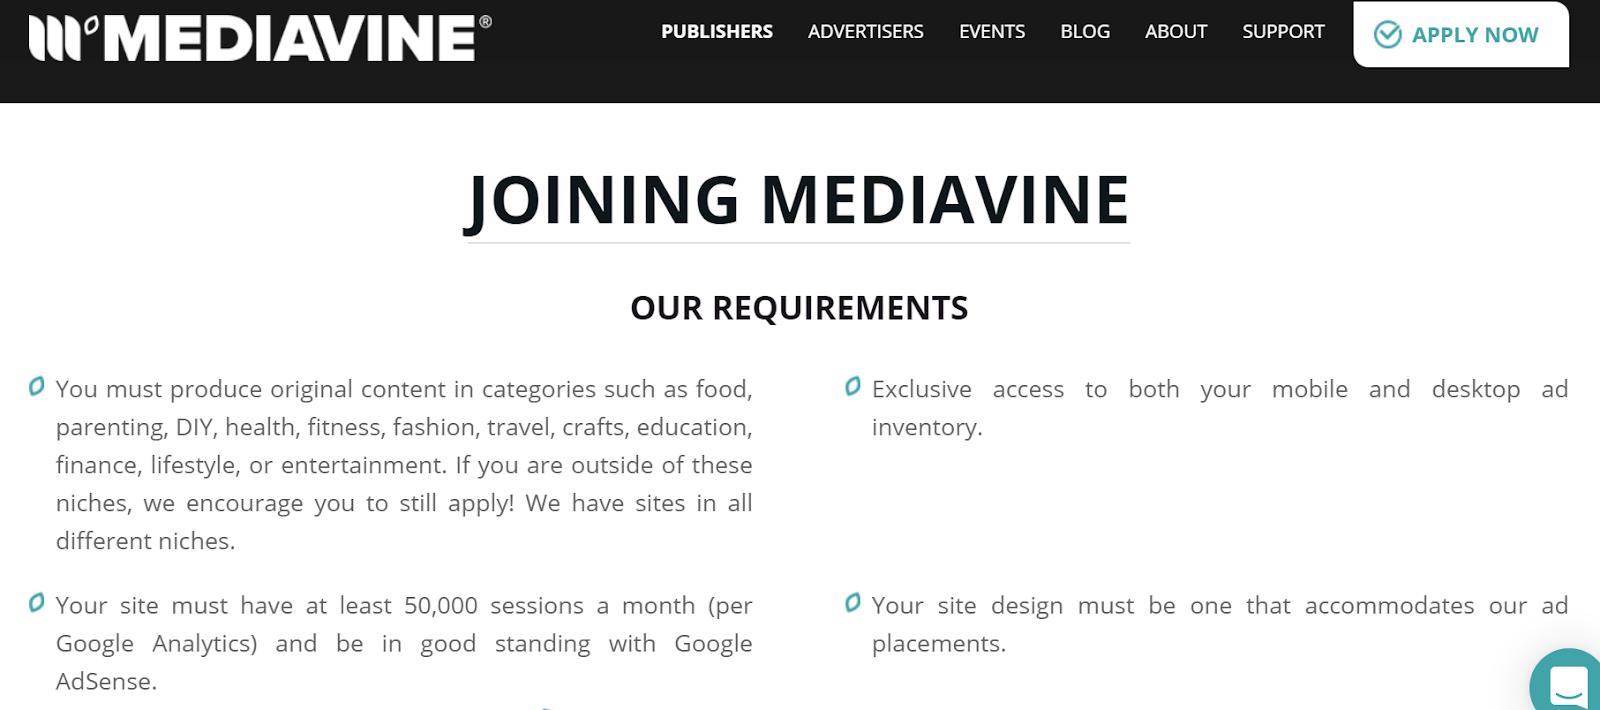 Mediavine advertising platform